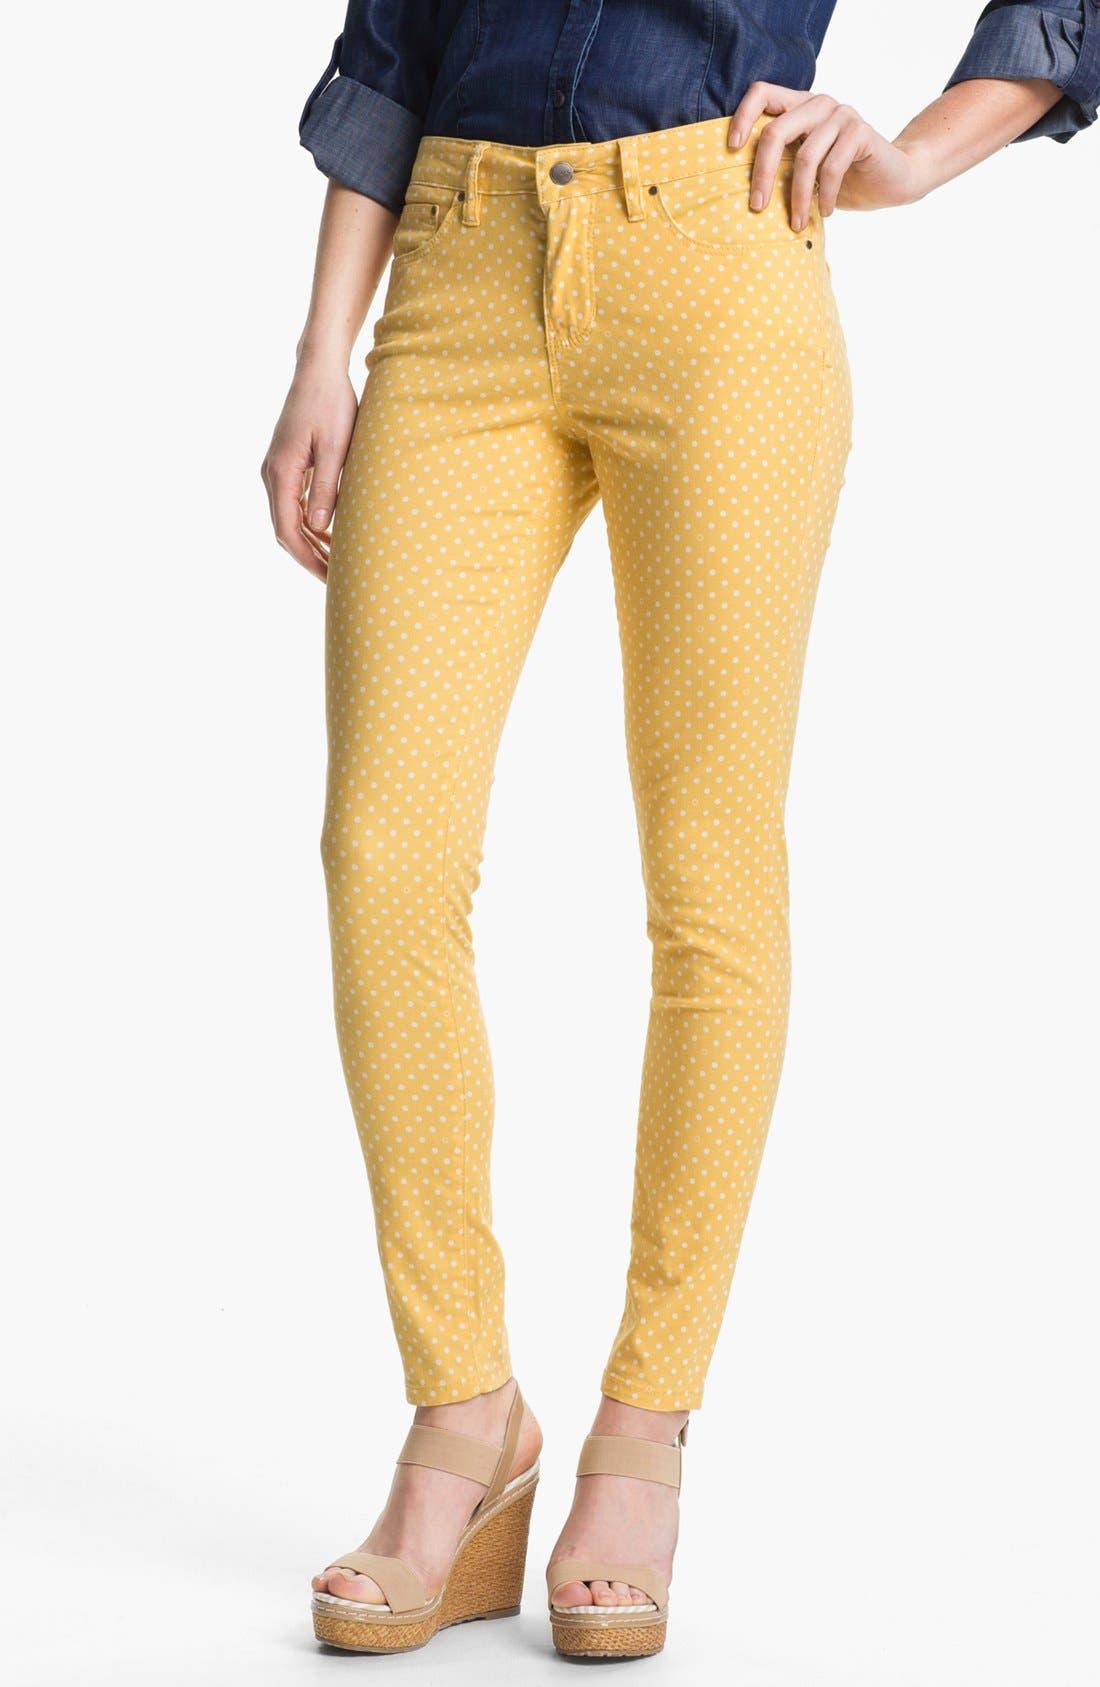 Alternate Image 1 Selected - Jag Jeans 'Chloe' Skinny Twill Pants (Petite)